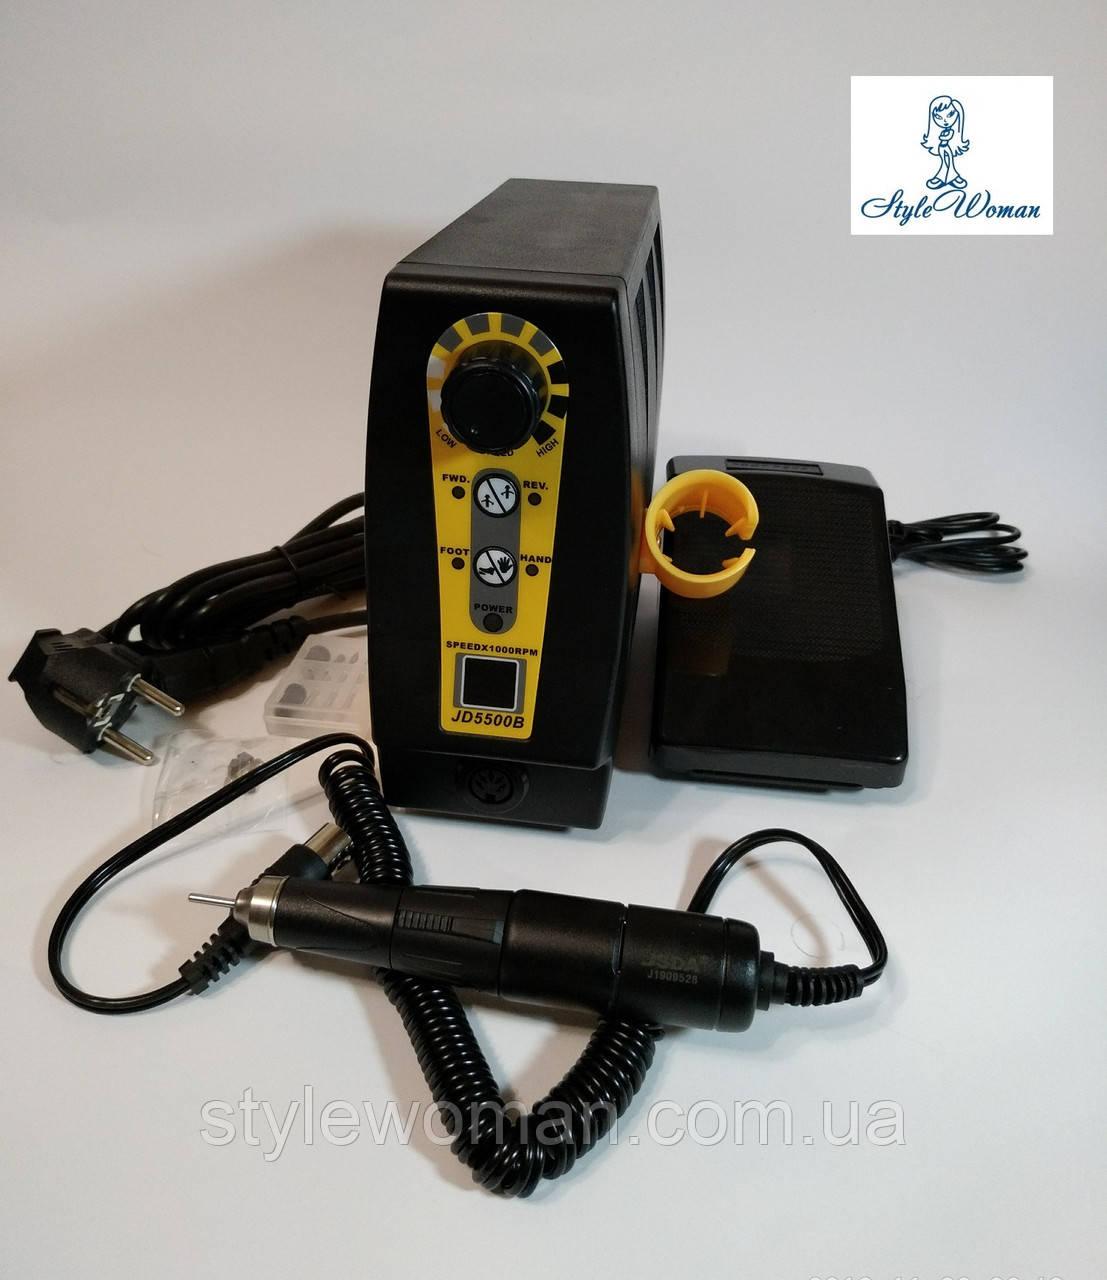 Фрезерный аппарат Electric Drill JD 5500 B 85w 35000 оборотов в минуту